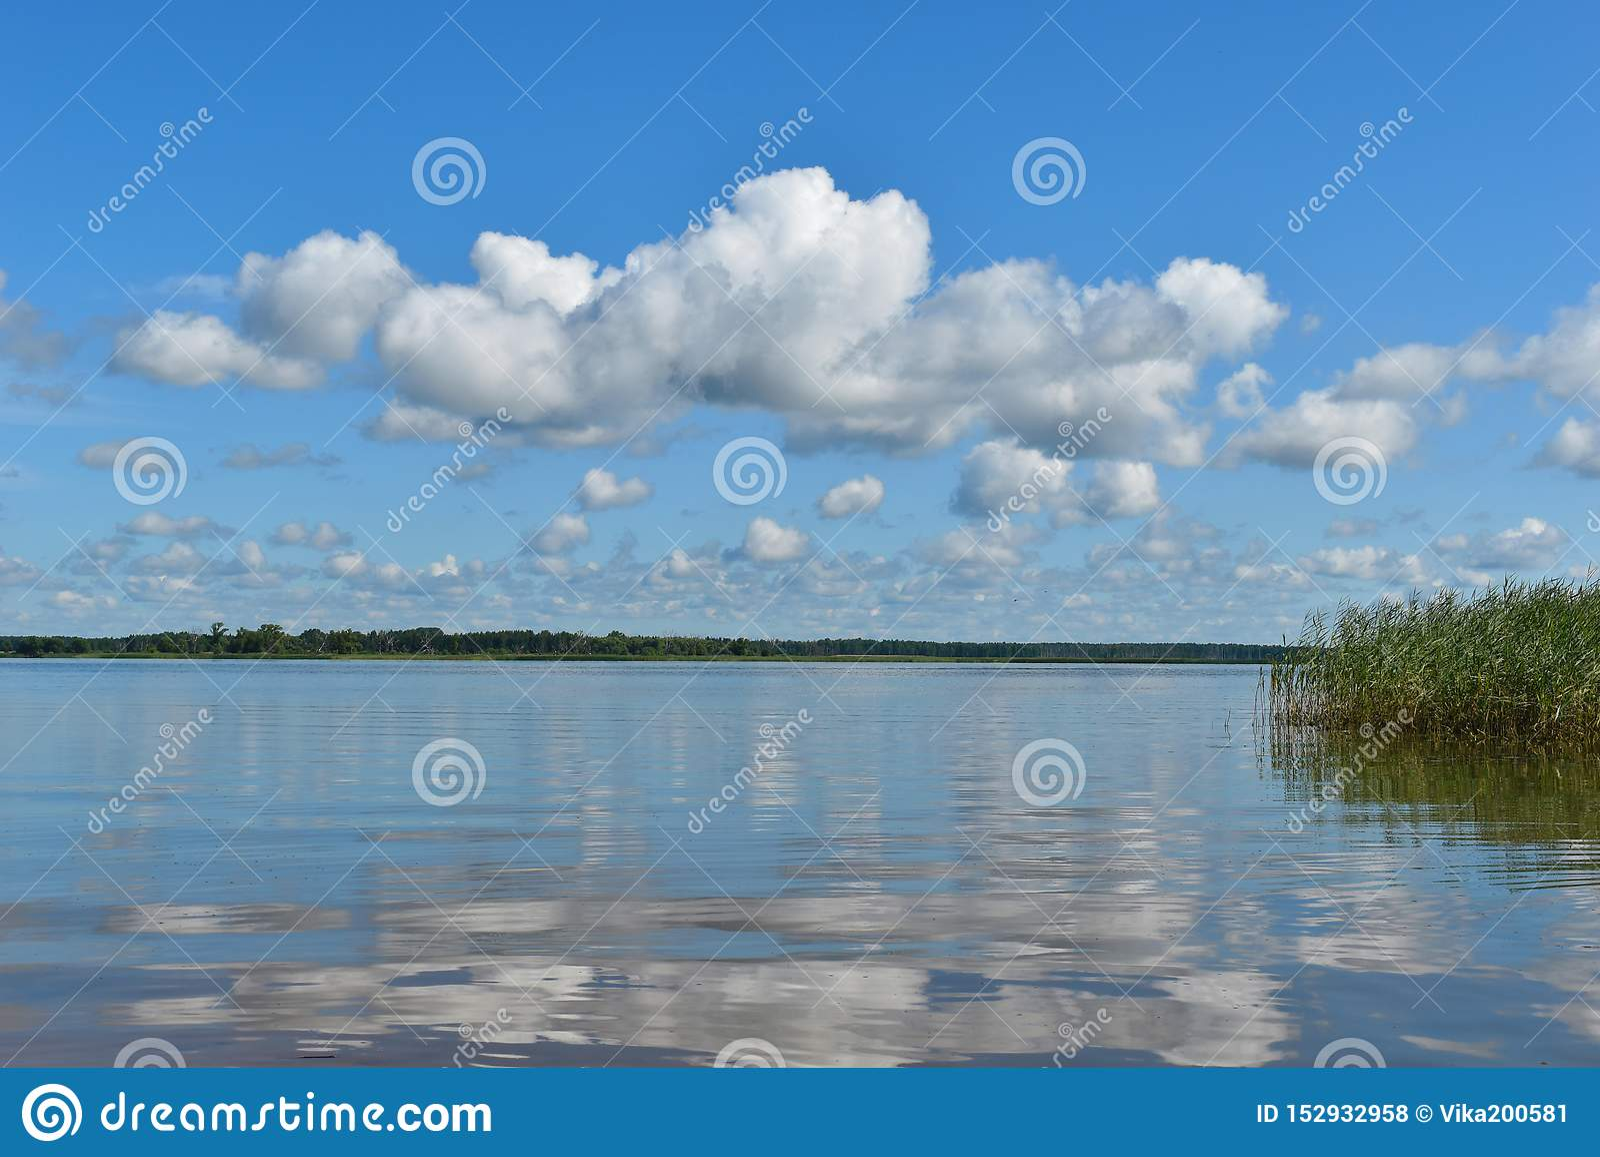 Beautiful water landscape